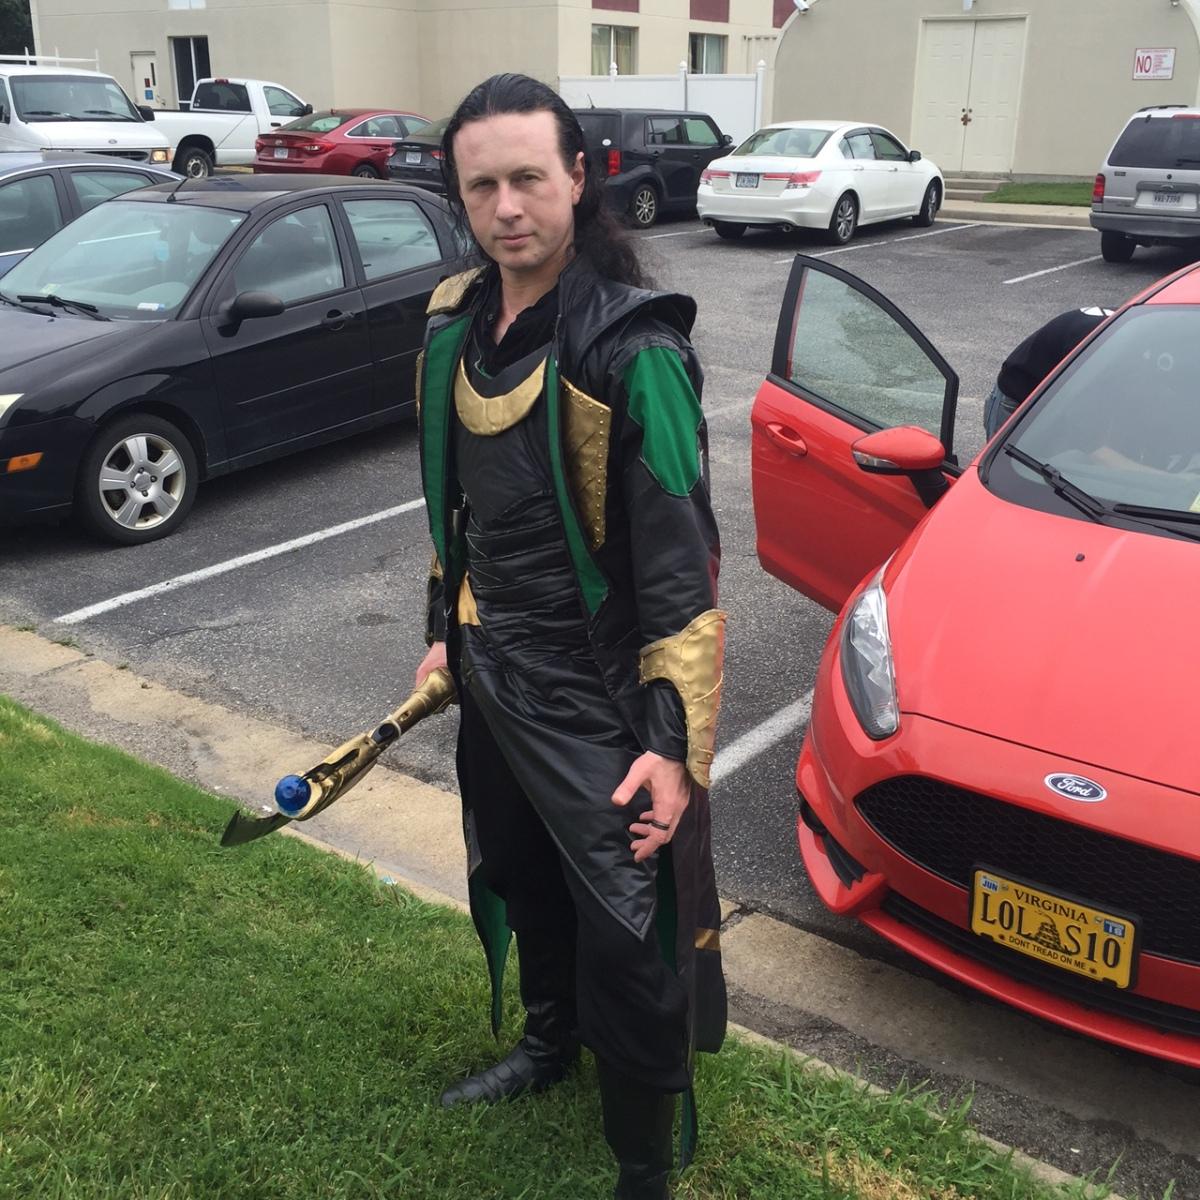 Loki God of Mischief, Teller of Lies and Stories